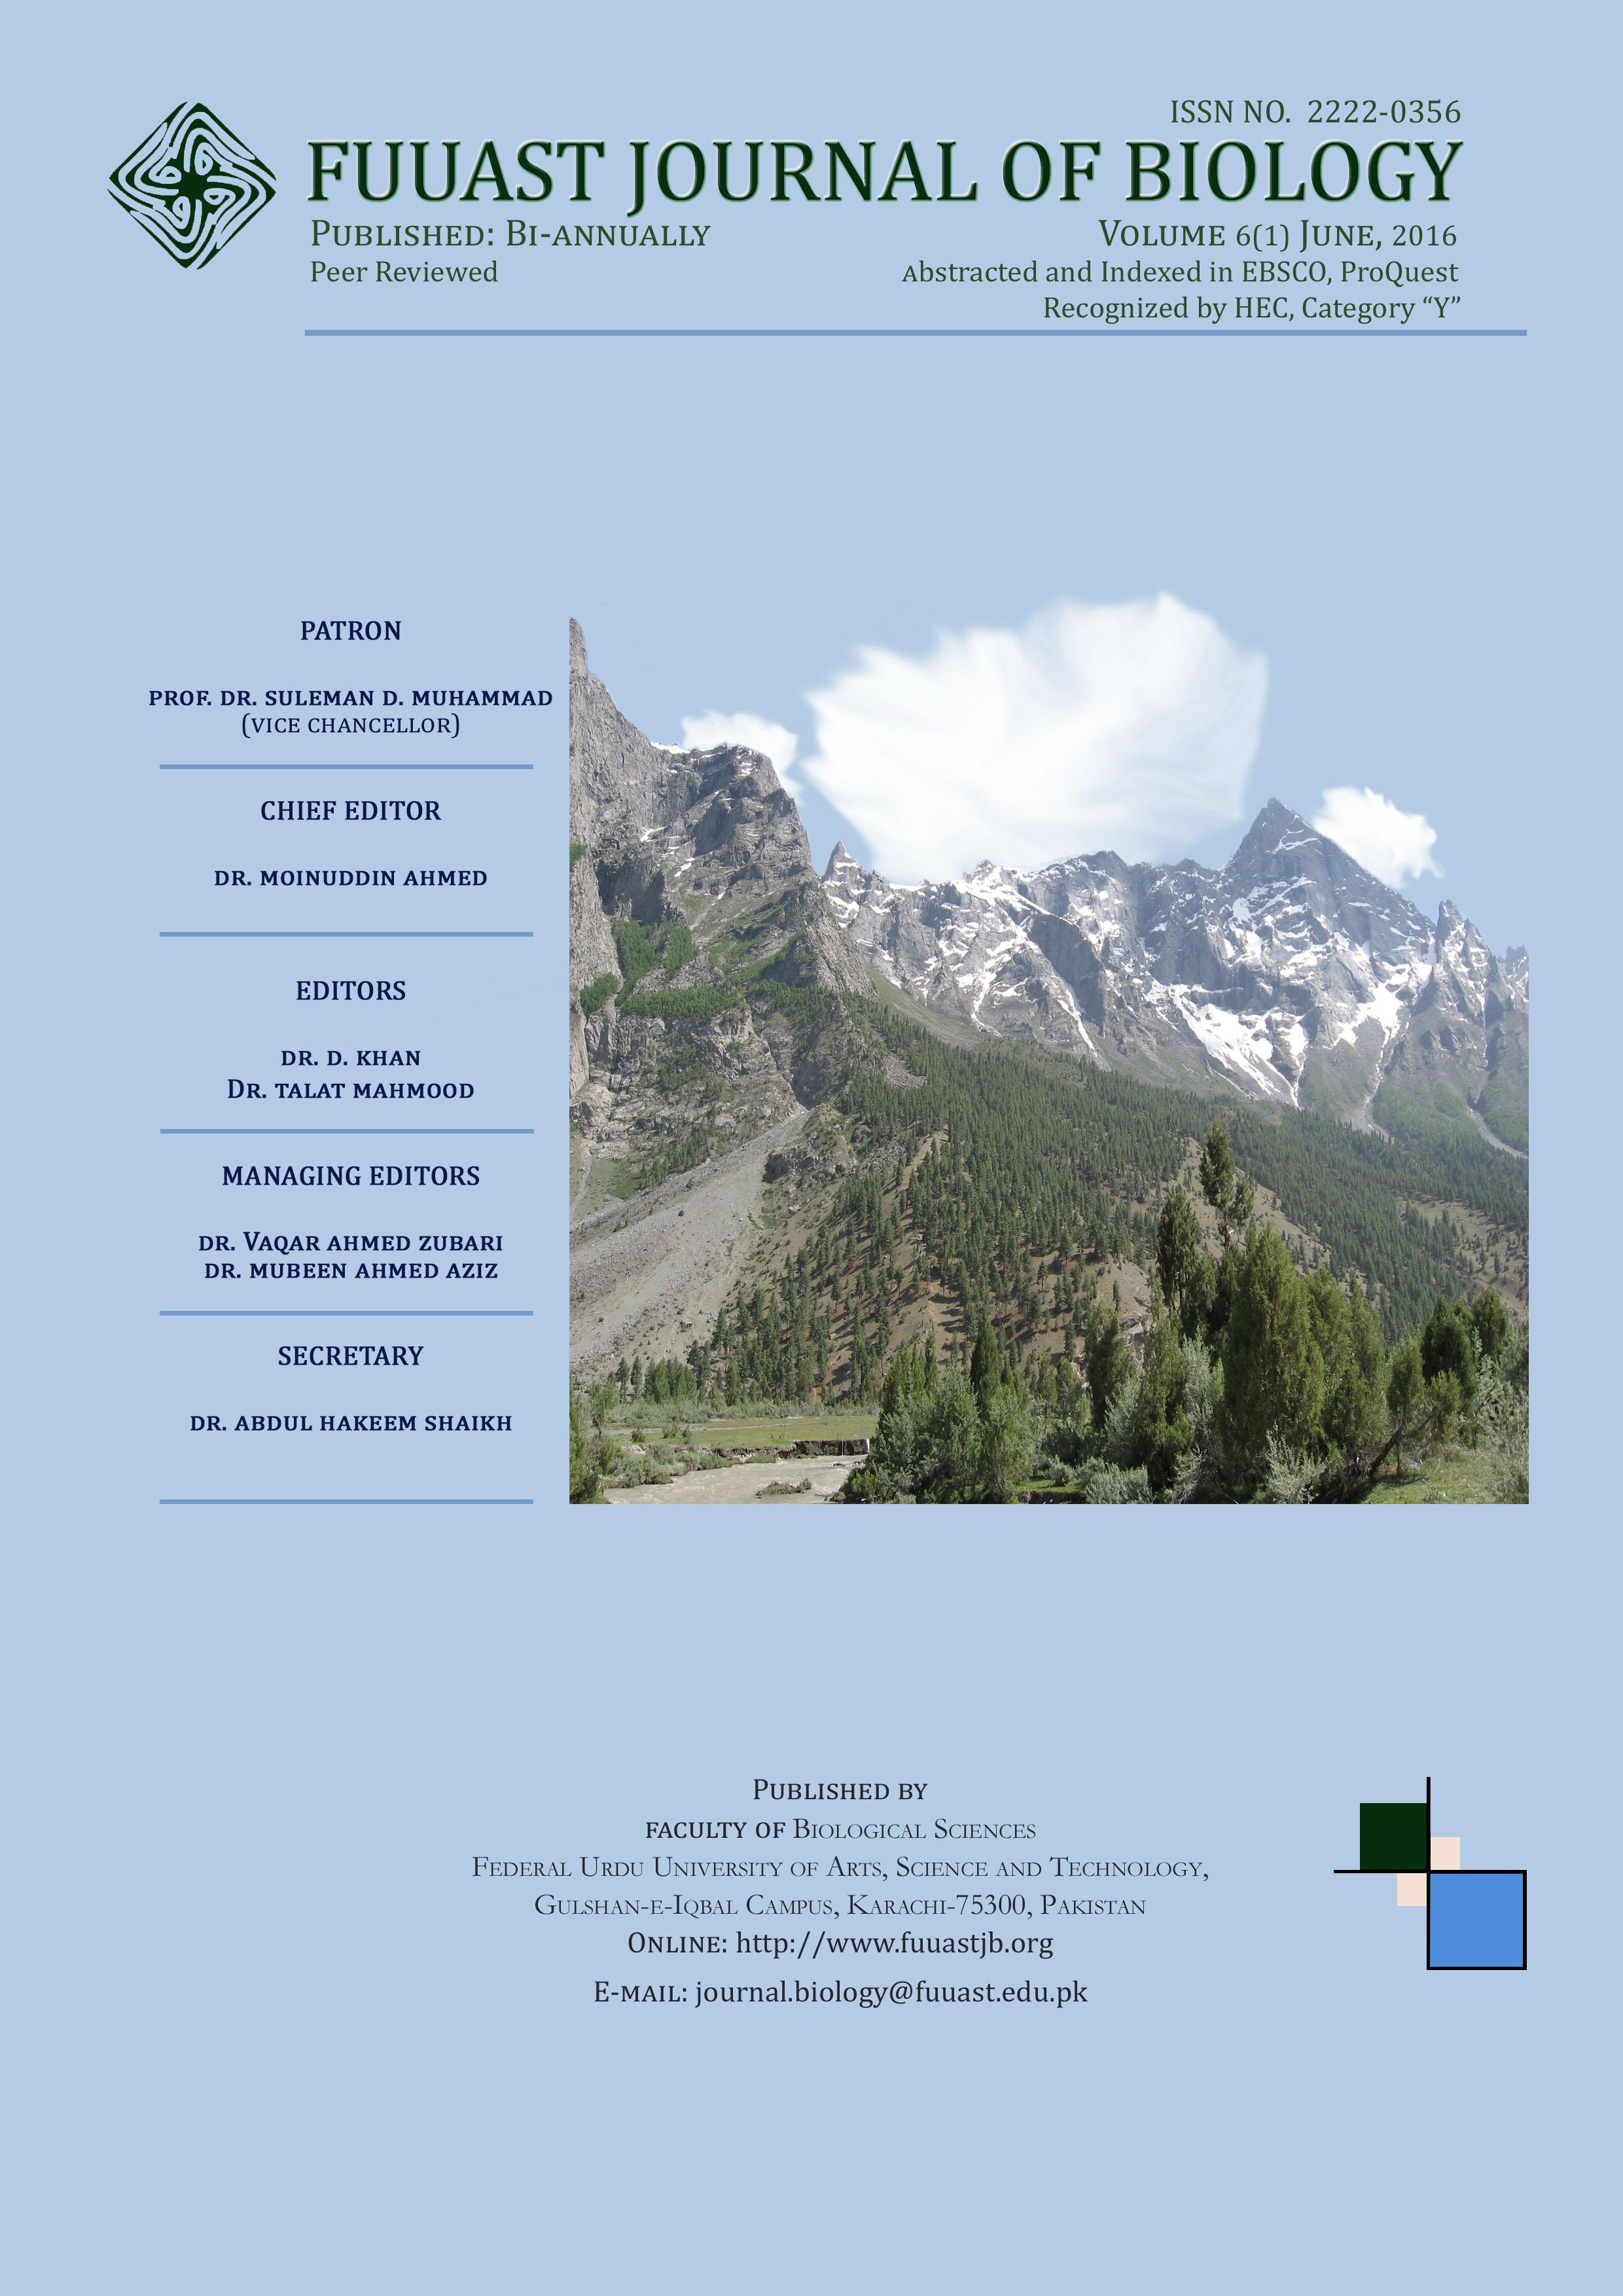 View Vol. 6 No. 1 (2016): Volume 6 (1) June, 2016